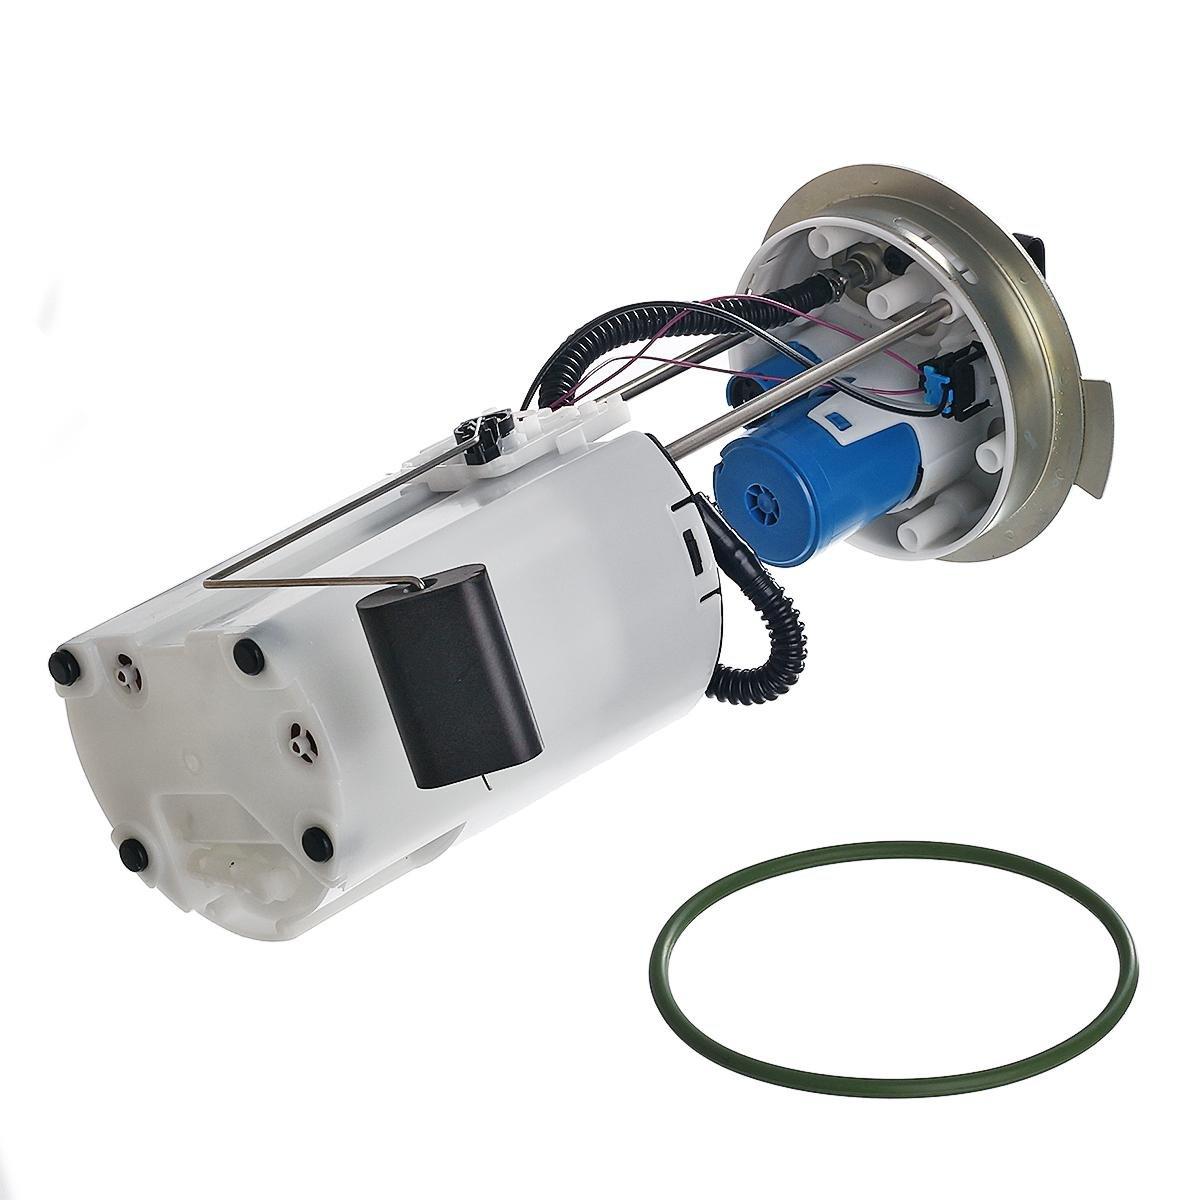 Powerco Electric Fuel Pump Replacement For 04 05 06 2000 Chevrolet Silverado 1500 V6 43l With 2 Chevy 2006 2005 2004 Crew Cab 48l 53l Sending Unit E3684m Automotive